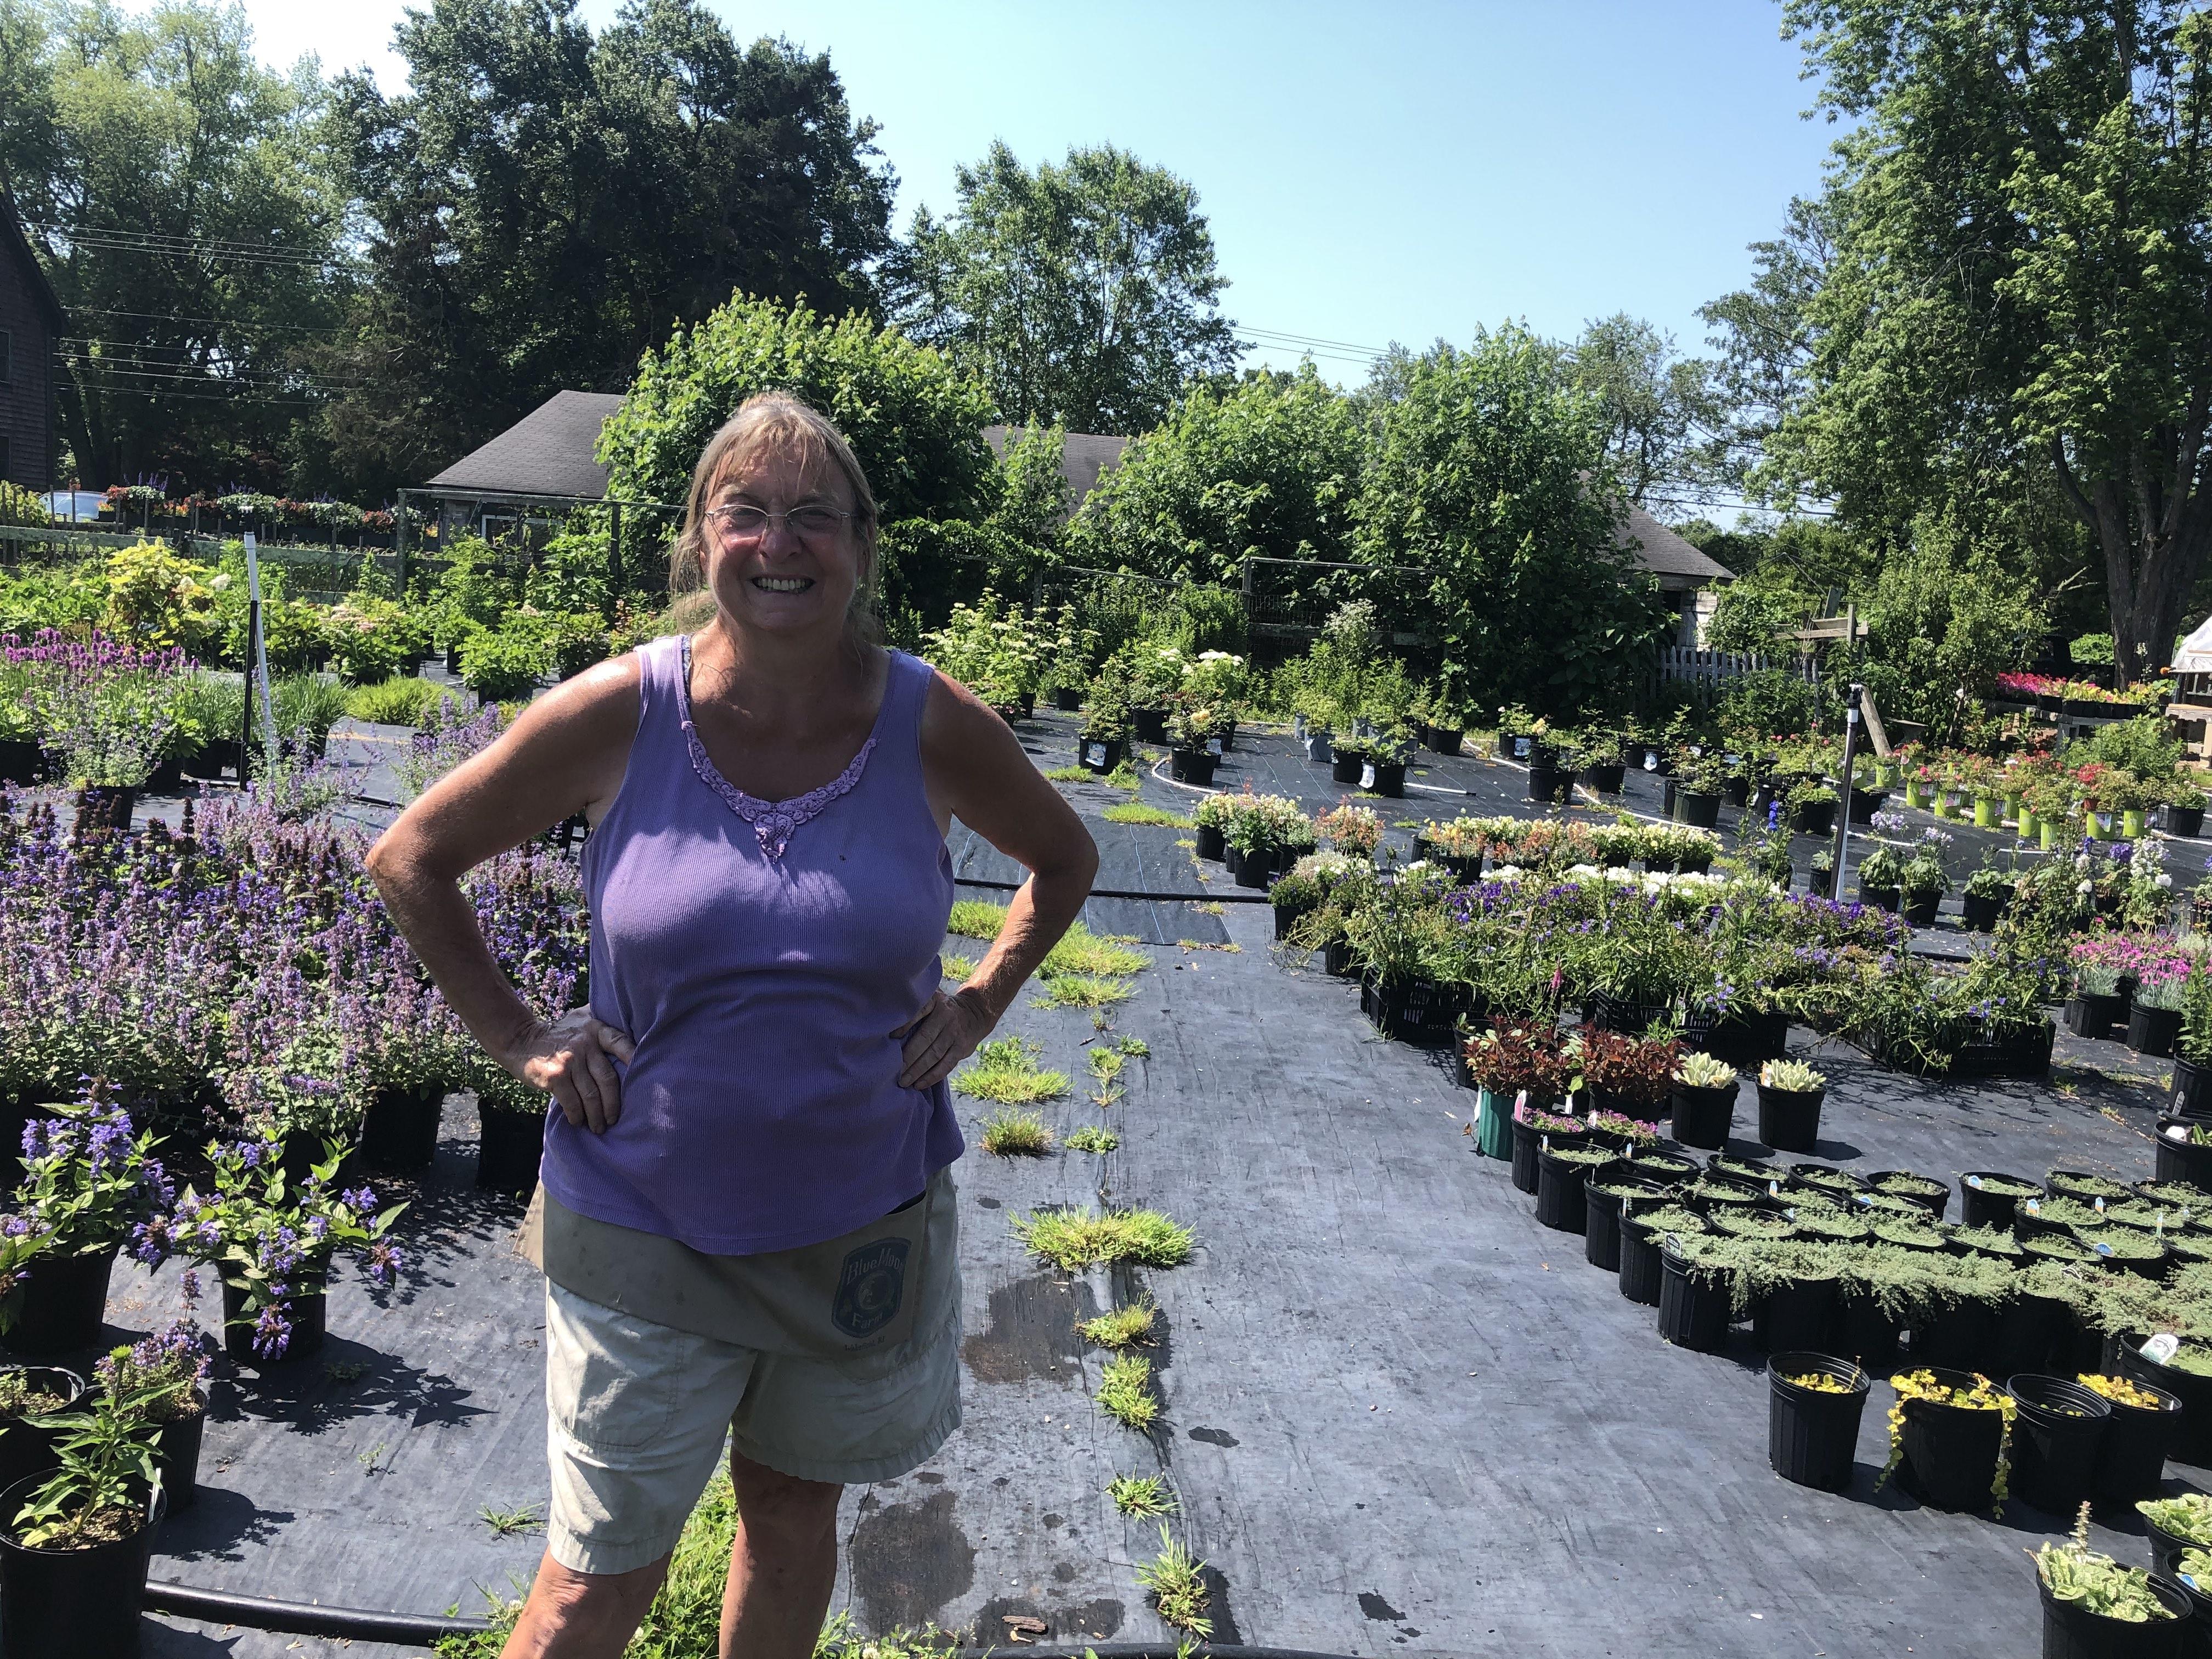 Caption: Jane Case of Blue Moon Farm, Credit: Megan Hall